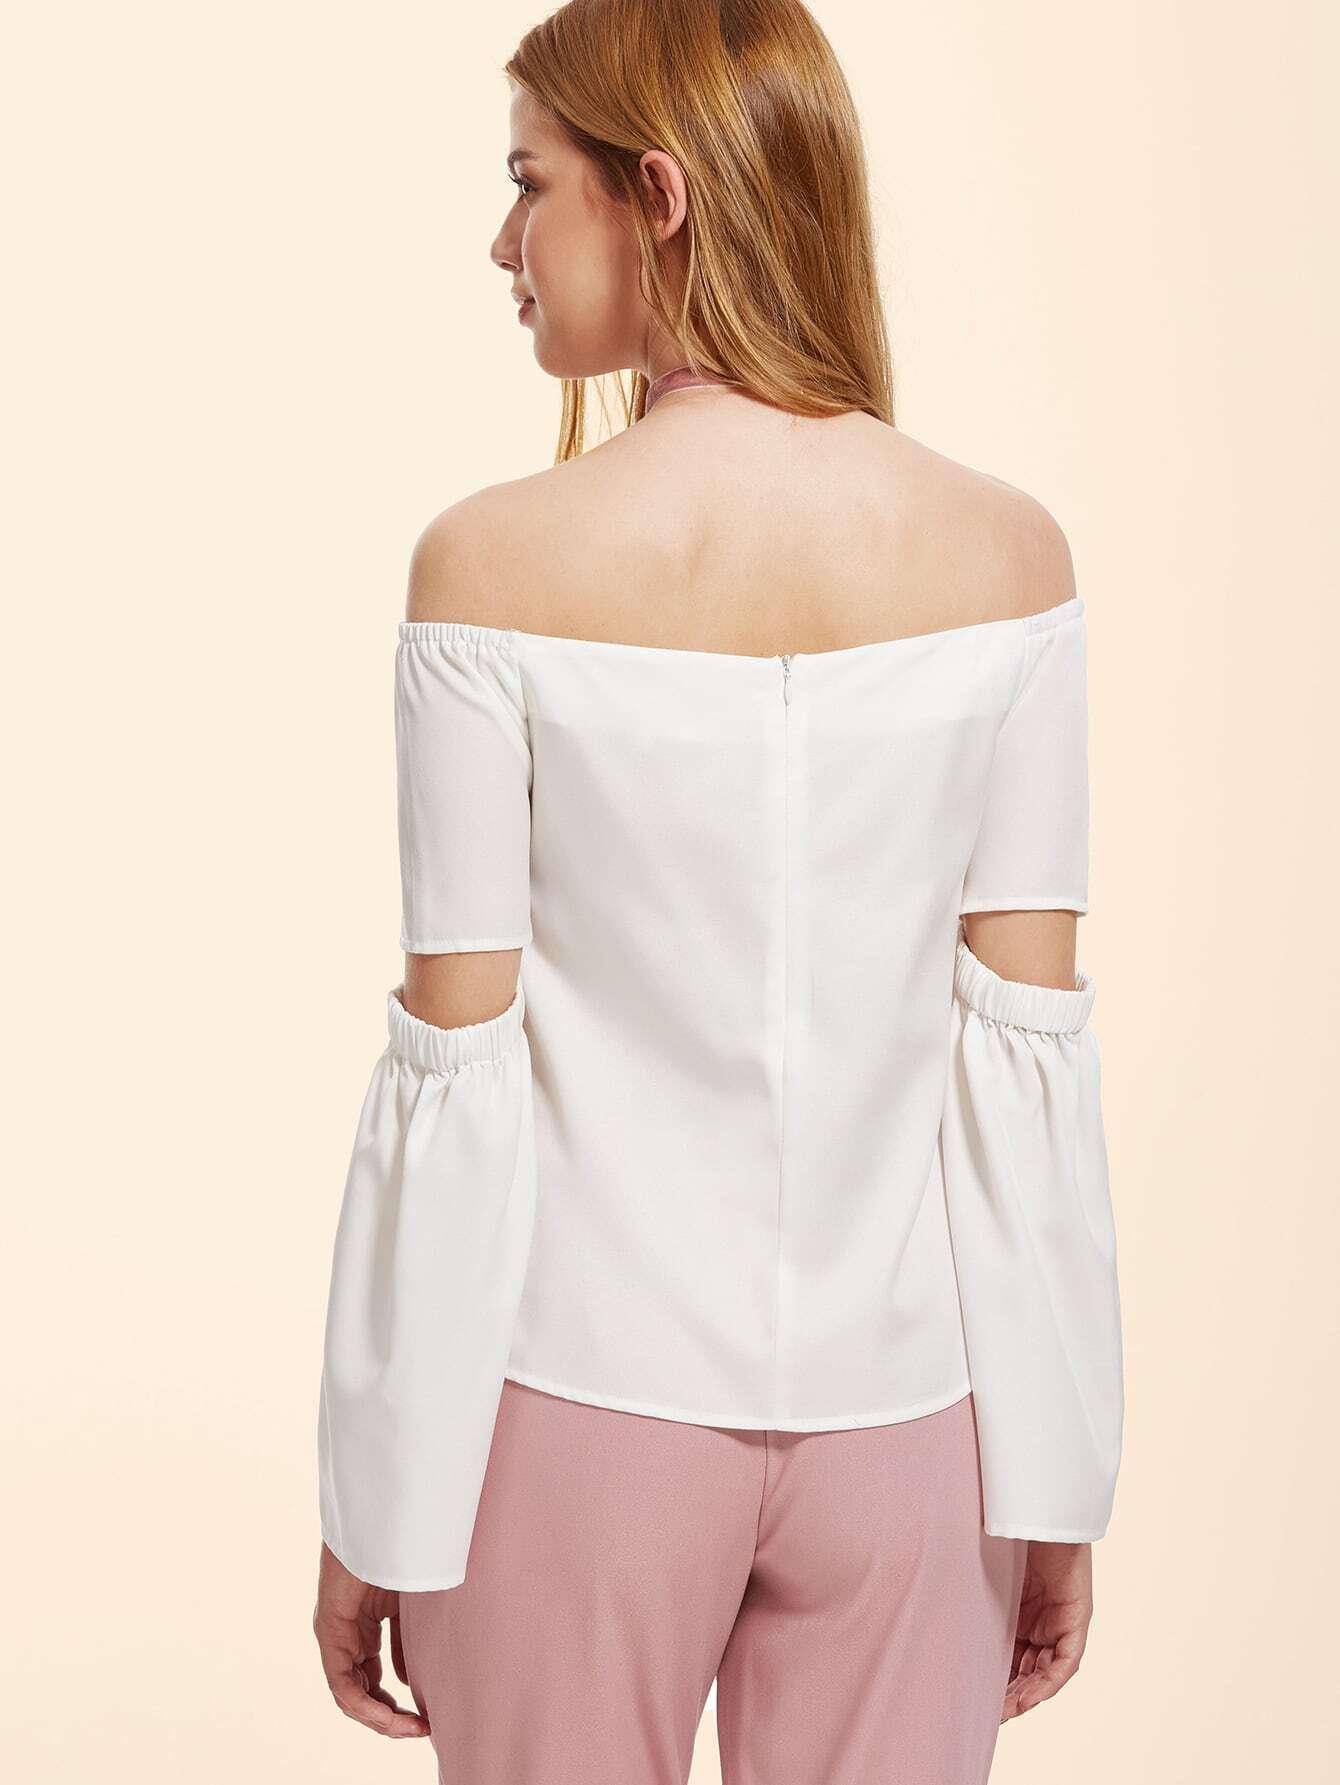 blouse160804725_2